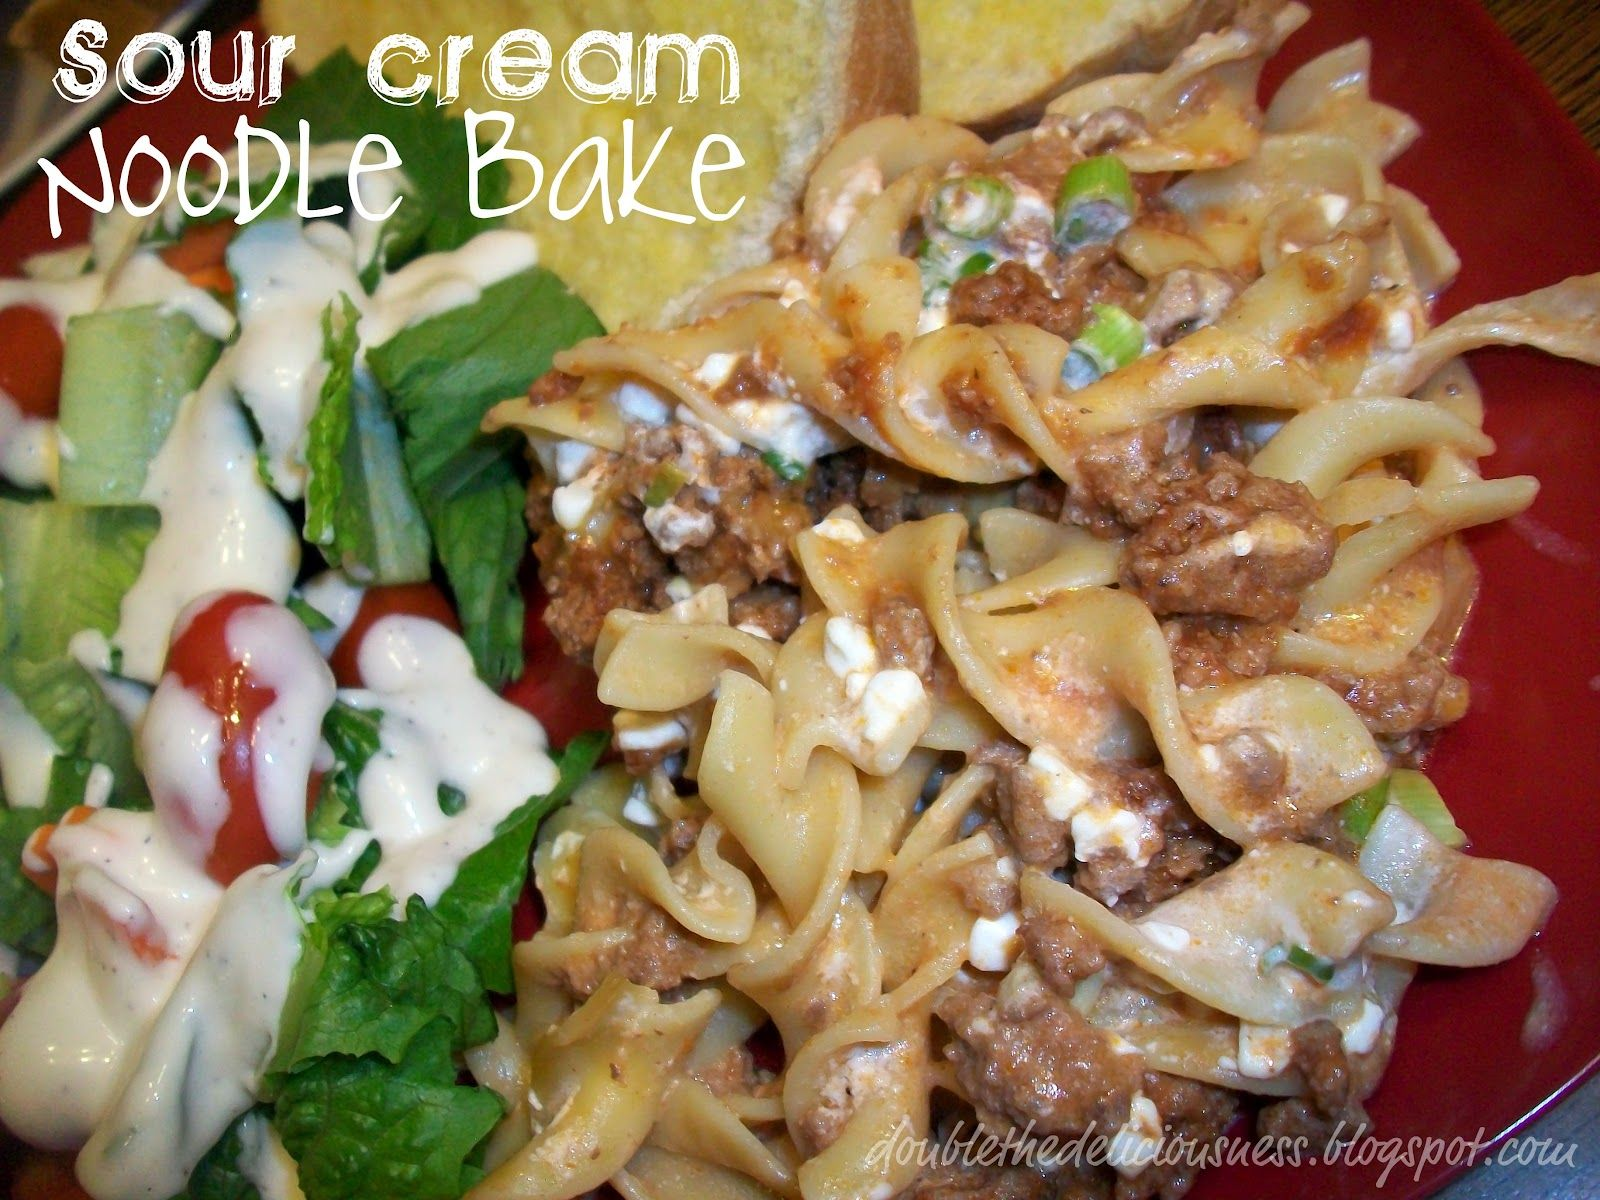 Sour Cream Noodle Bake #sourcreamnoodlebake